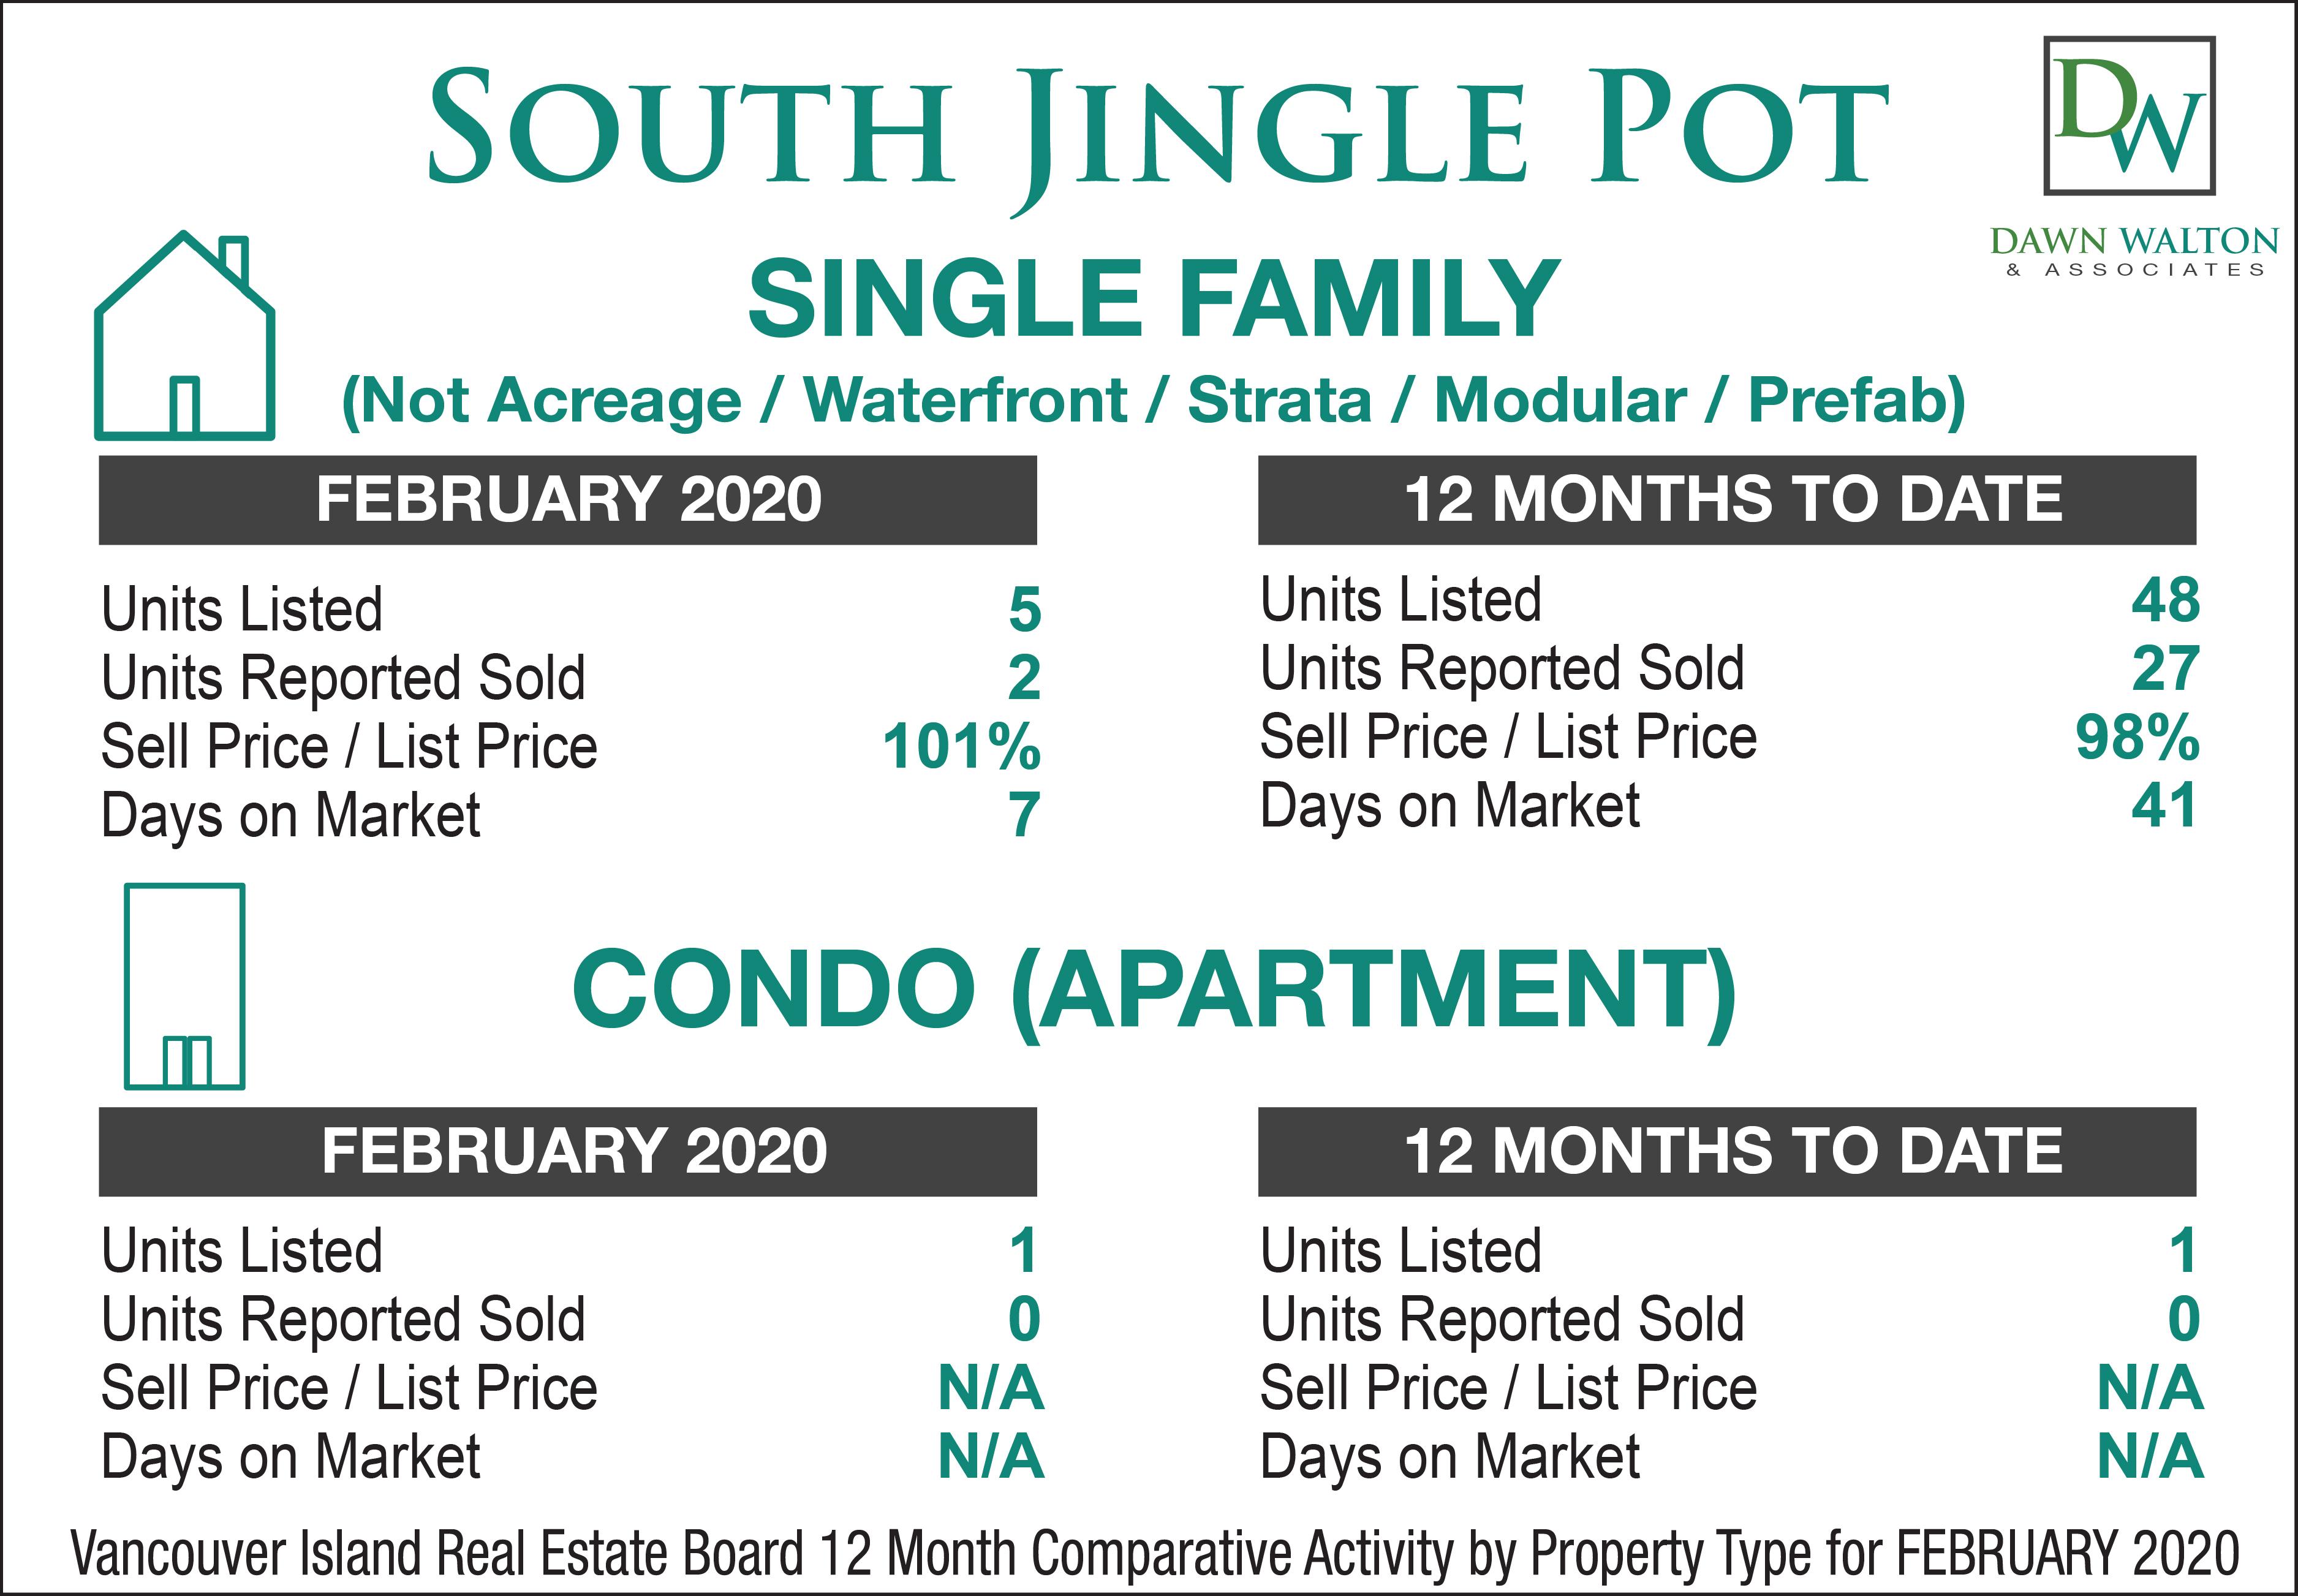 South Jingle Pot Real Estate Market Stats February 2020 - Nanaimo Realtor Dawn Walton